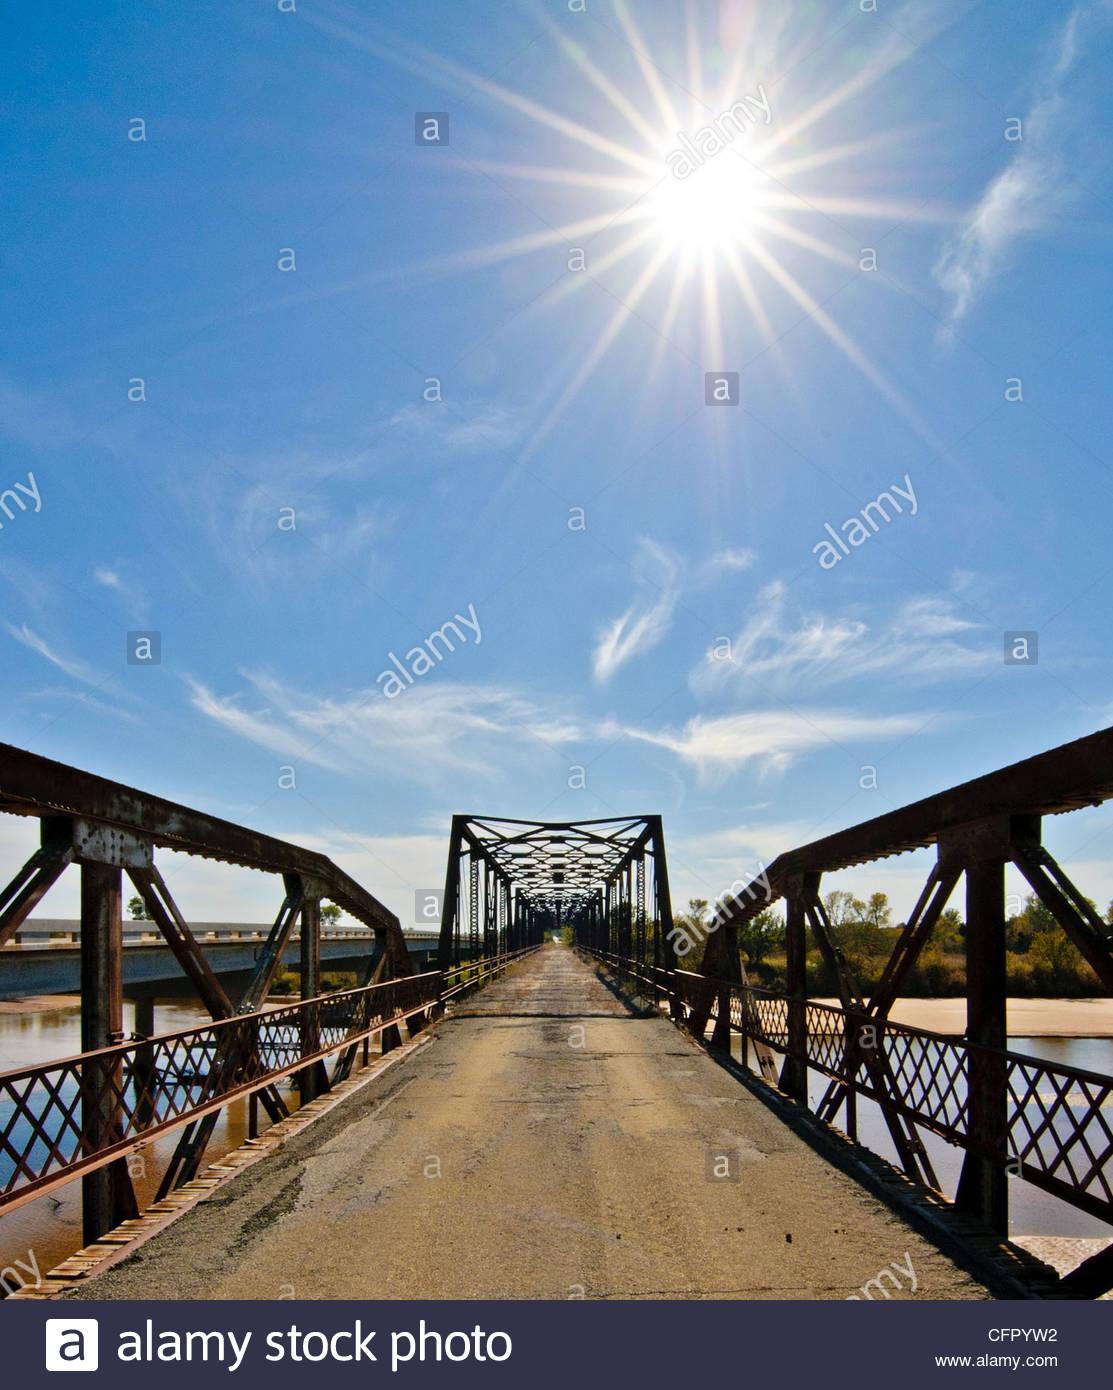 Old Bridge over Cimarron River, Rural Kingfisher County, Oklahoma, Oct 31., 2010 - Stock Image